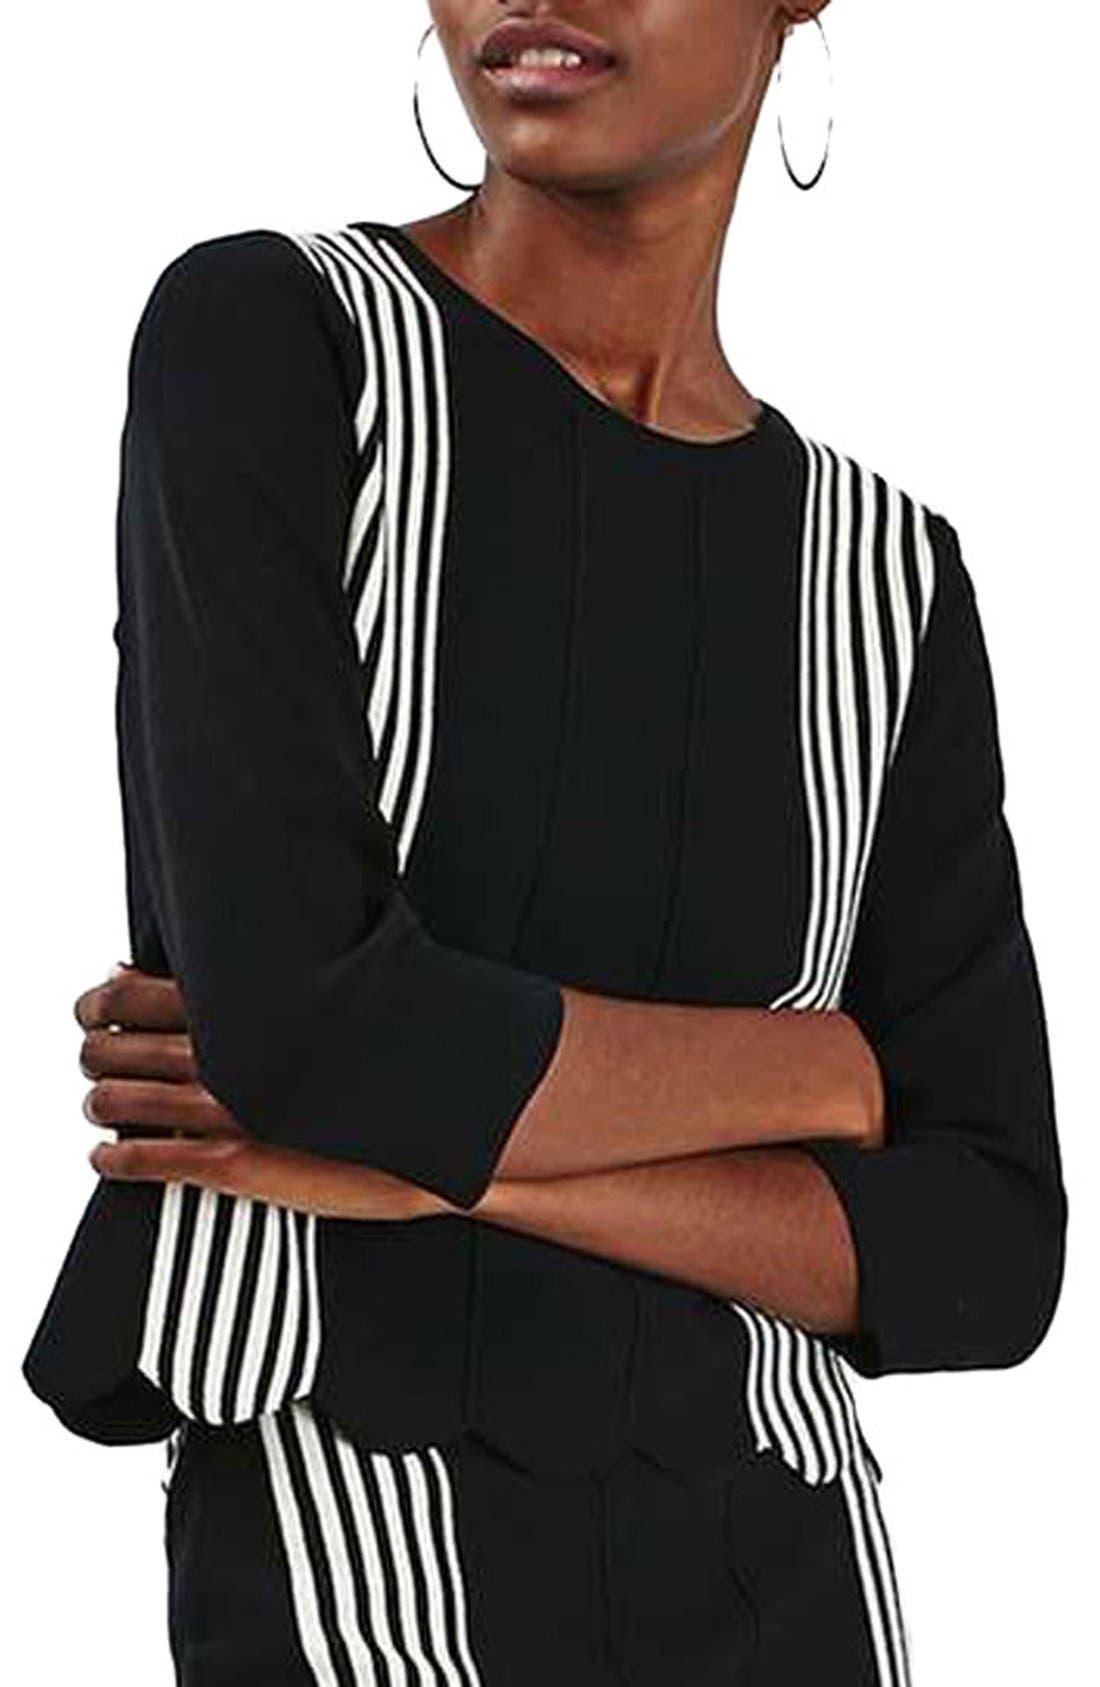 Alternate Image 1 Selected - Topshop Stripe Detail Scalloped Knit Top